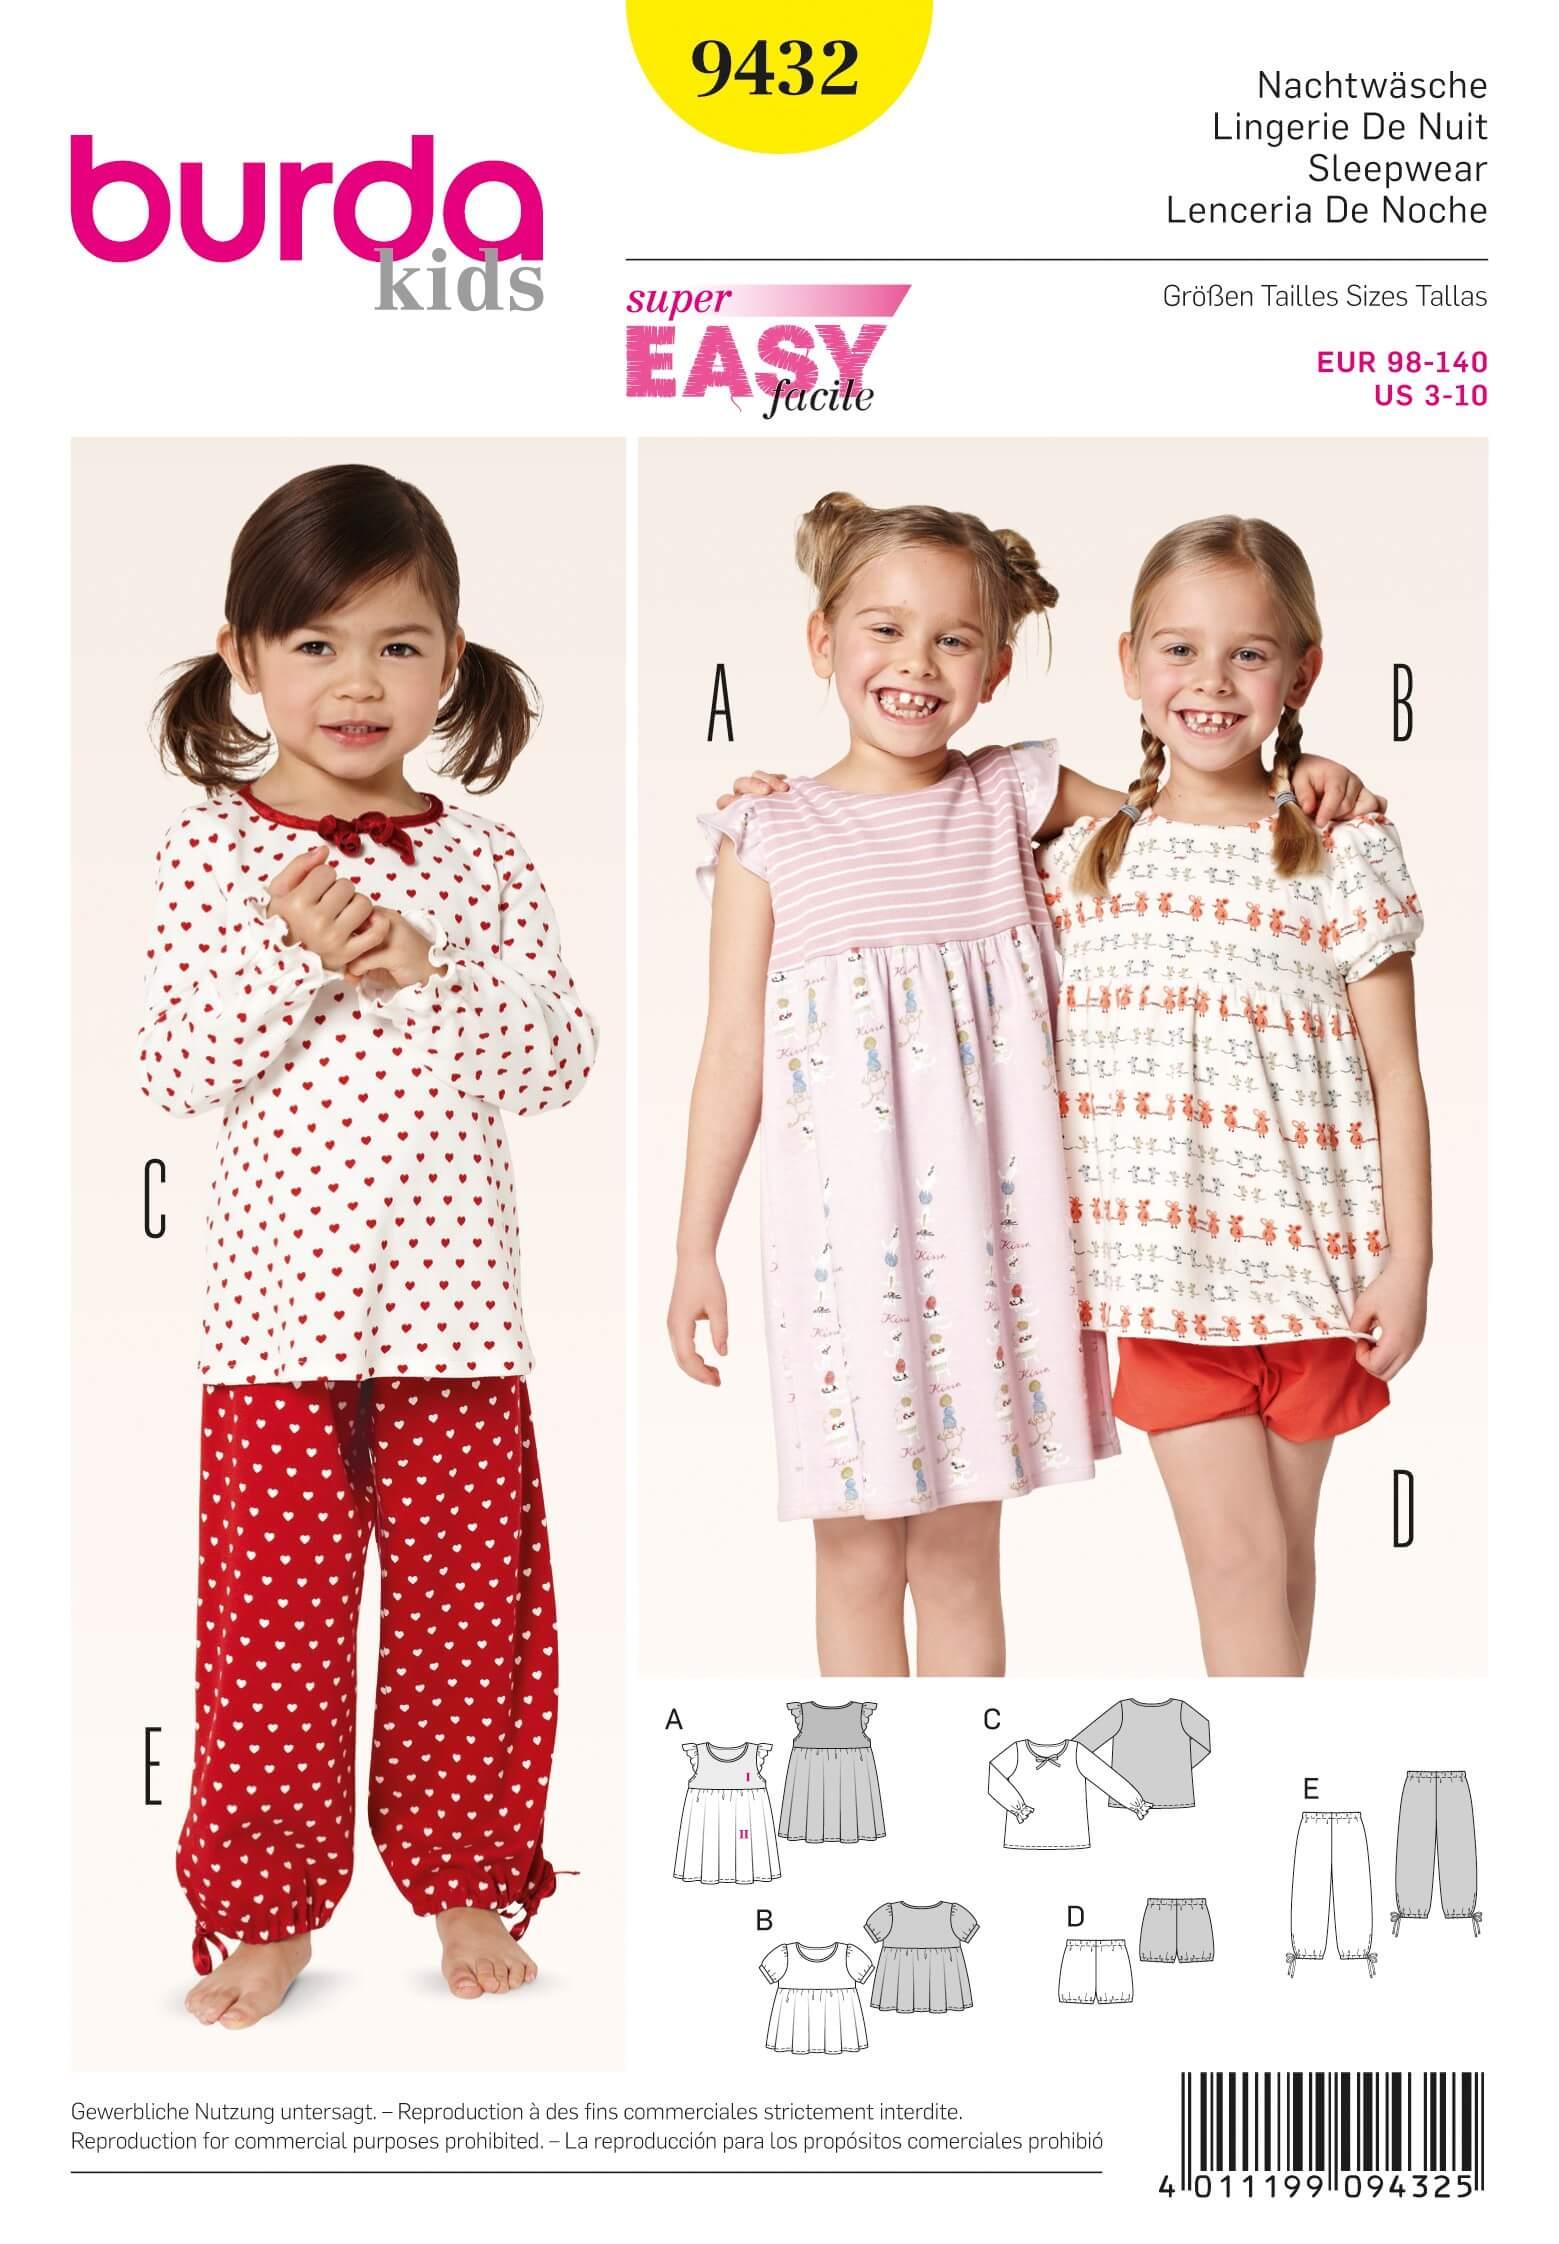 Burda Kids Girls Sleepwear PJs Fabric Sewing Pattern 9432